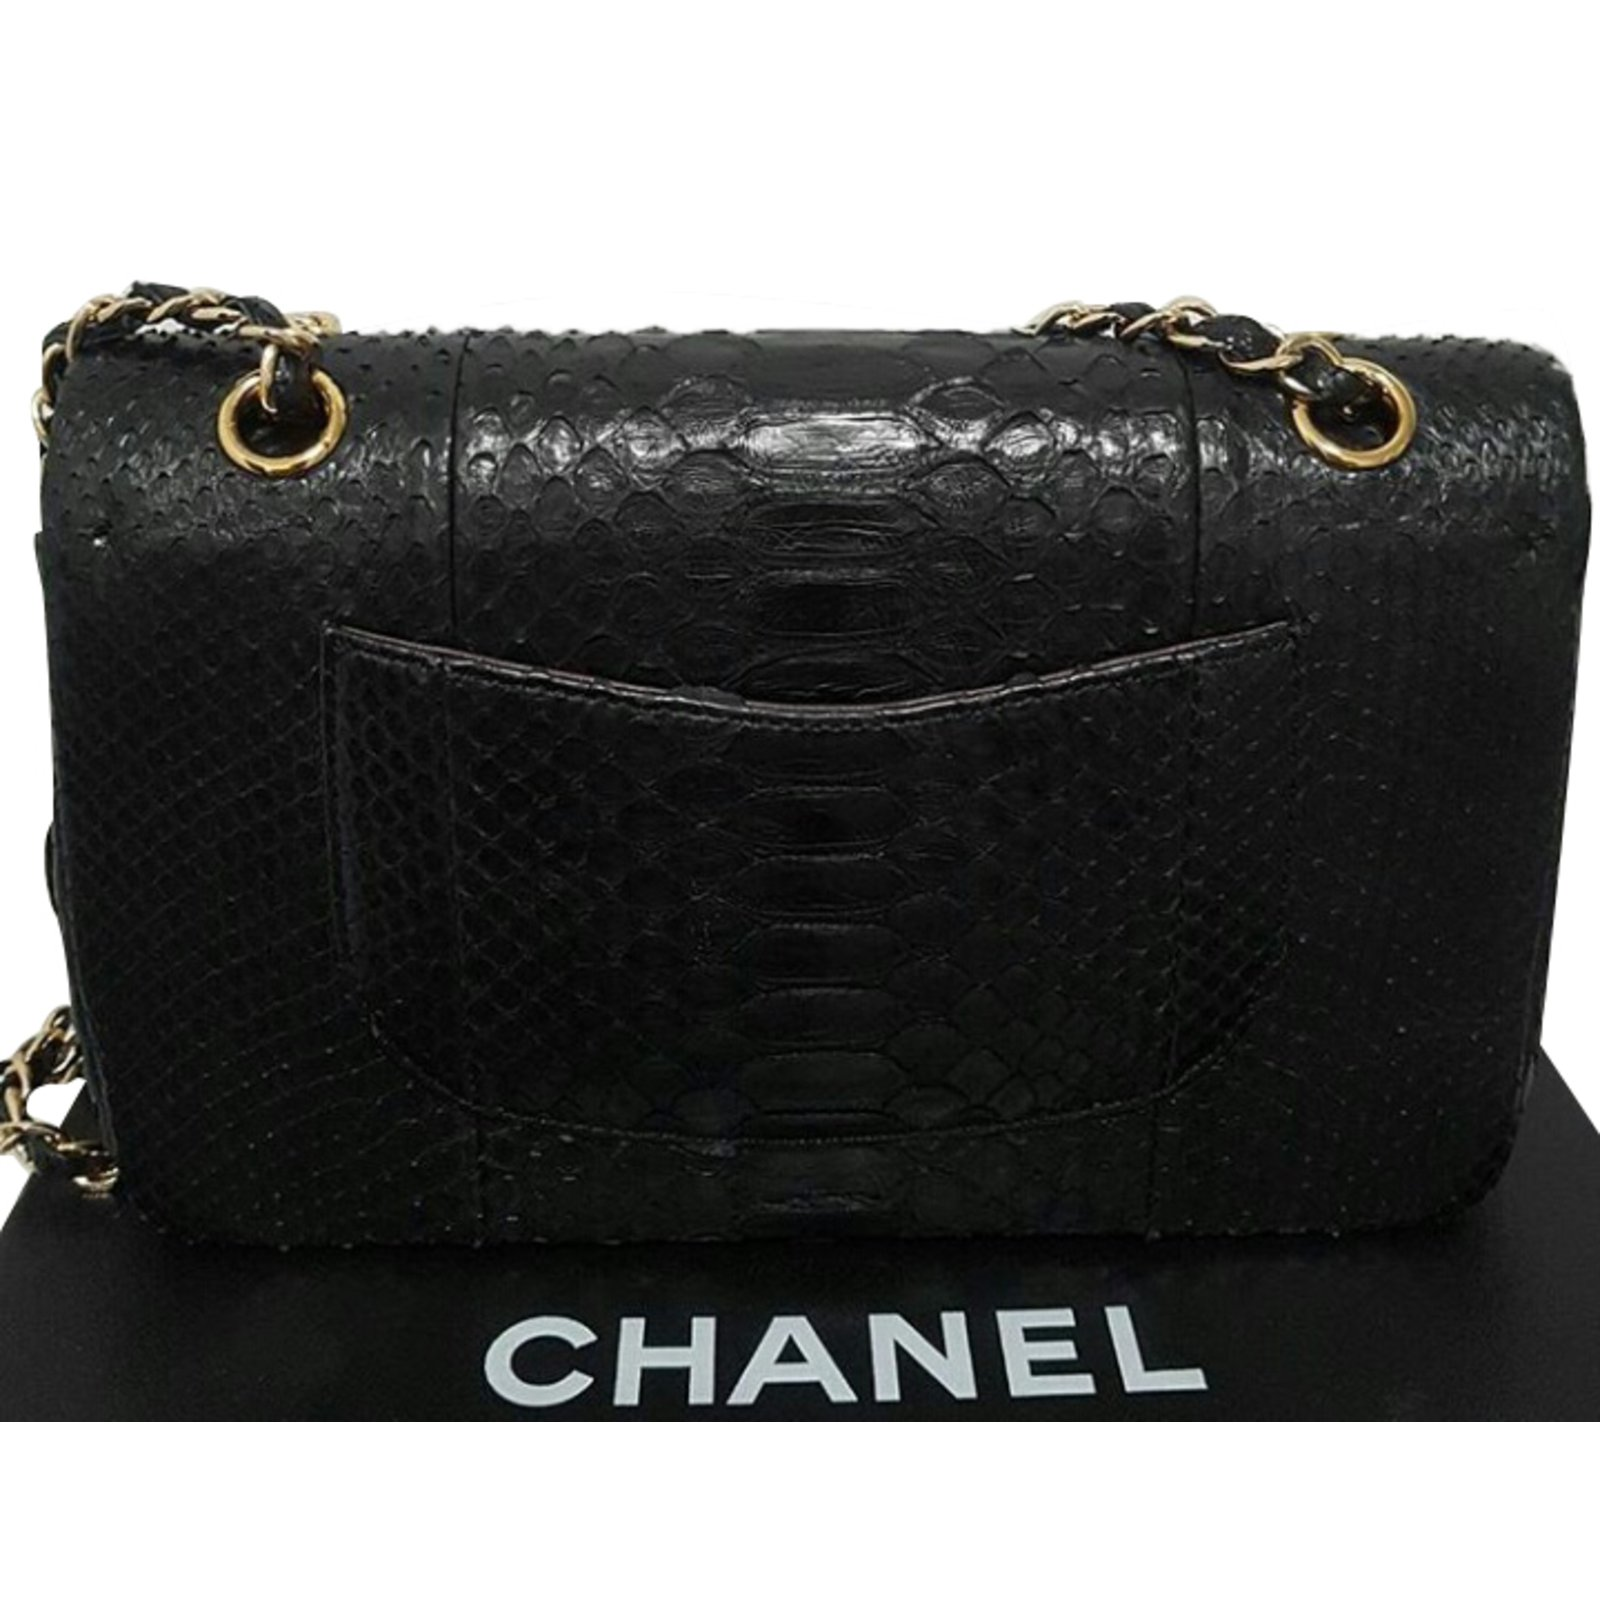 49244b7787 Chanel 2.55 classic Double flap python Handbags Exotic leather Black  ref.51671 - Joli Closet